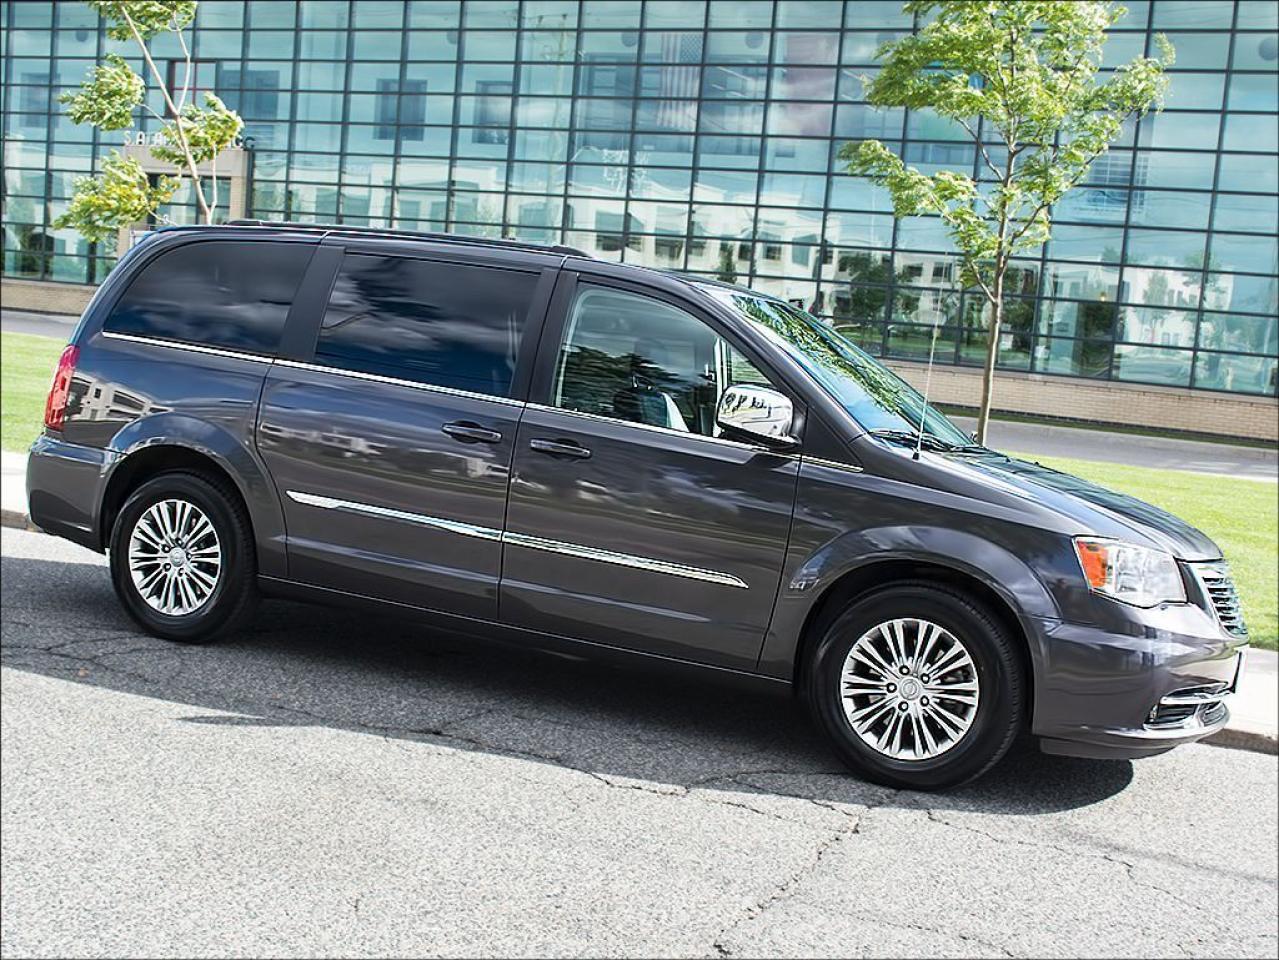 2015 Chrysler Town & Country LTD|LEATHER|NAVI|REARCAM|DUAL DVD/BLUE-RAY